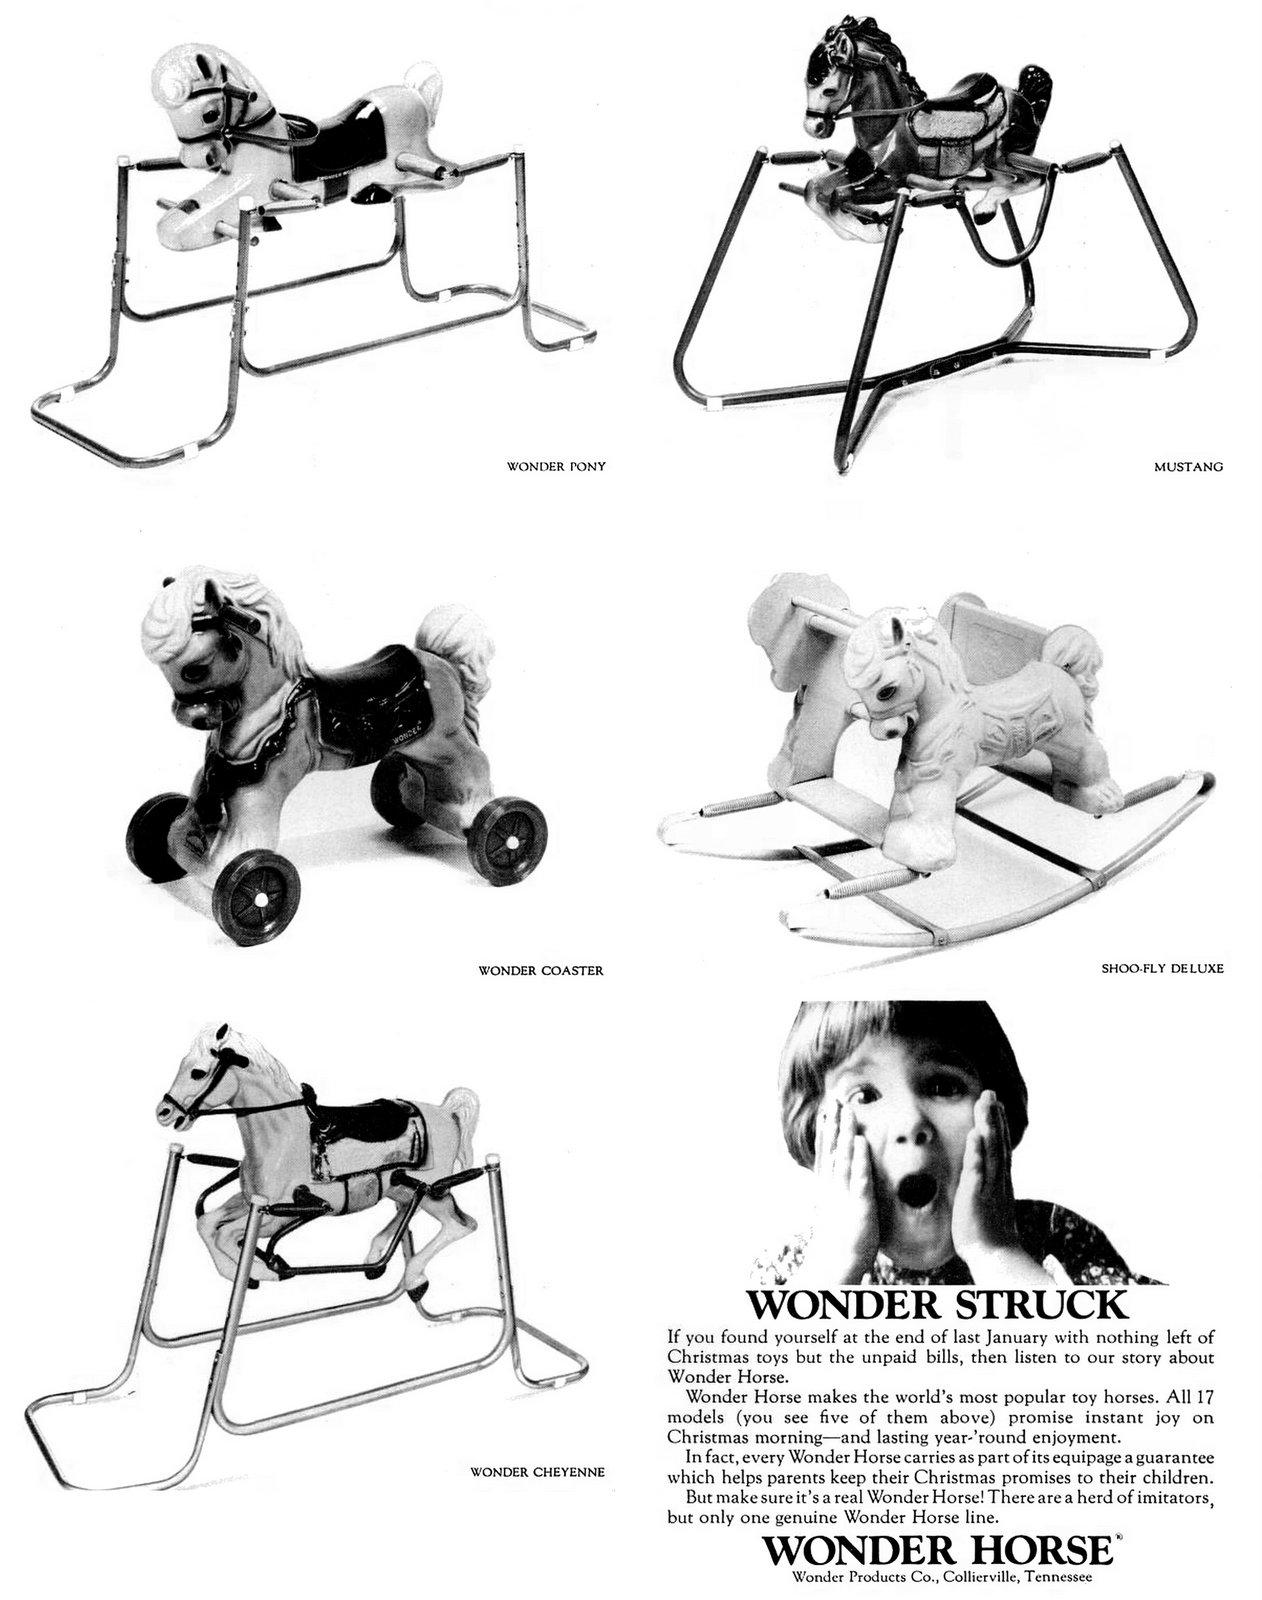 Wonder struck Vintage ride-on horse toys (1967)